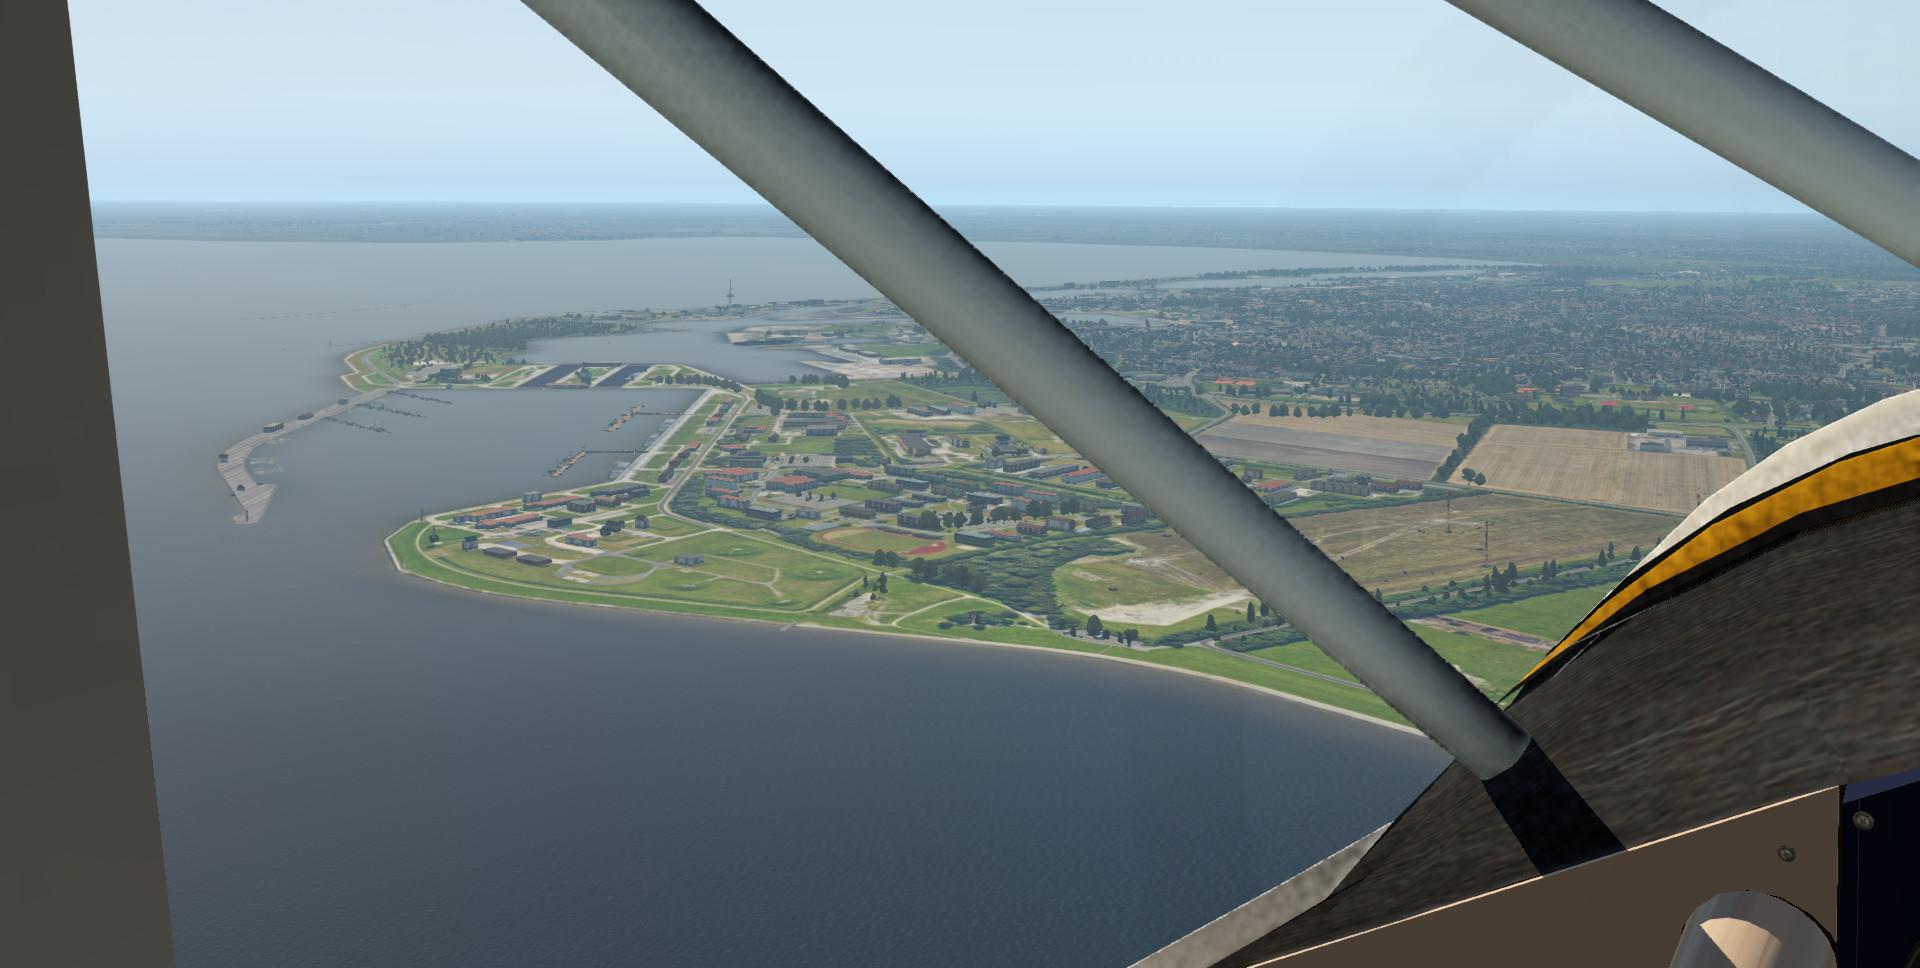 nordseerundflug-005rvkkz.jpg